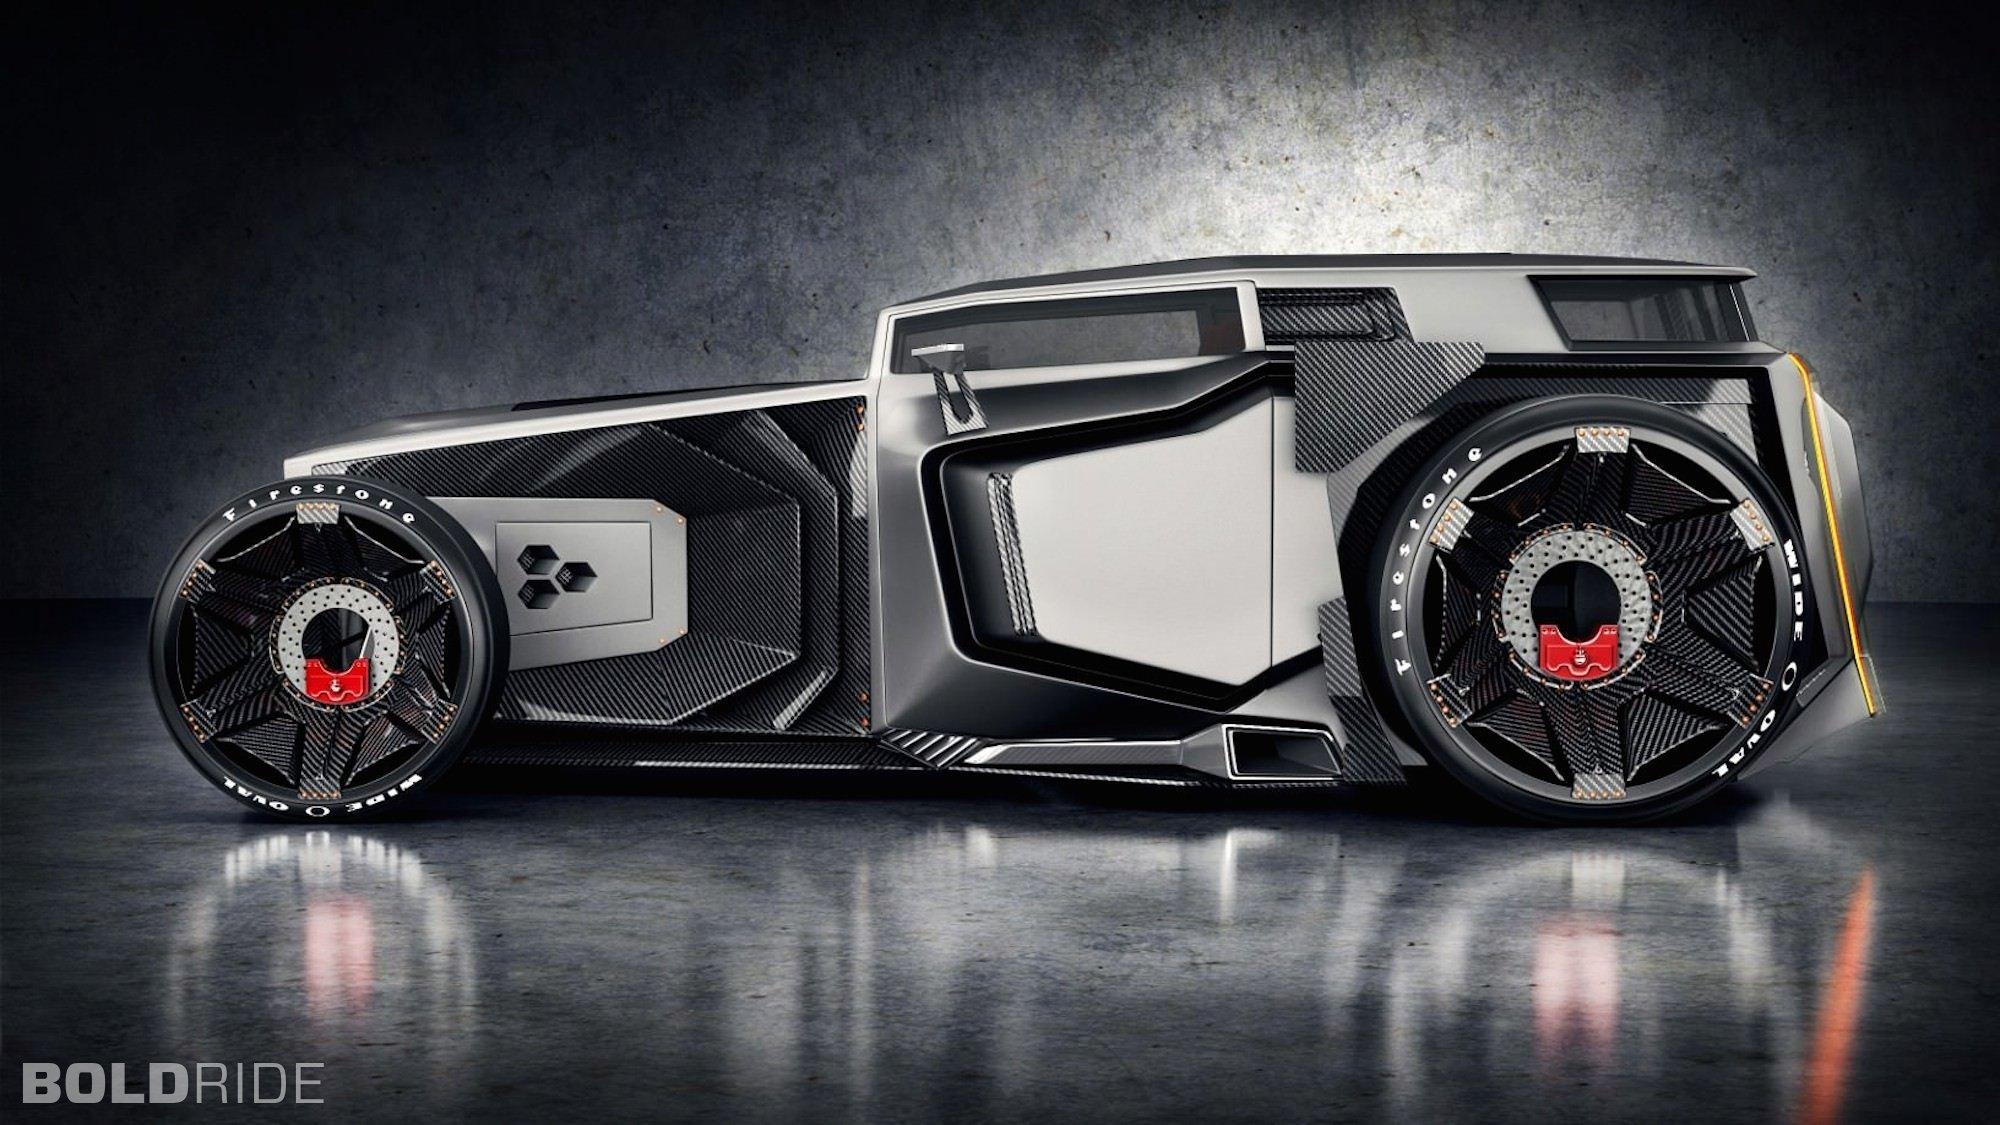 Lamborghini Rat Rod Concept hor rods muscle supercar 5 wallpaper 2000x1125